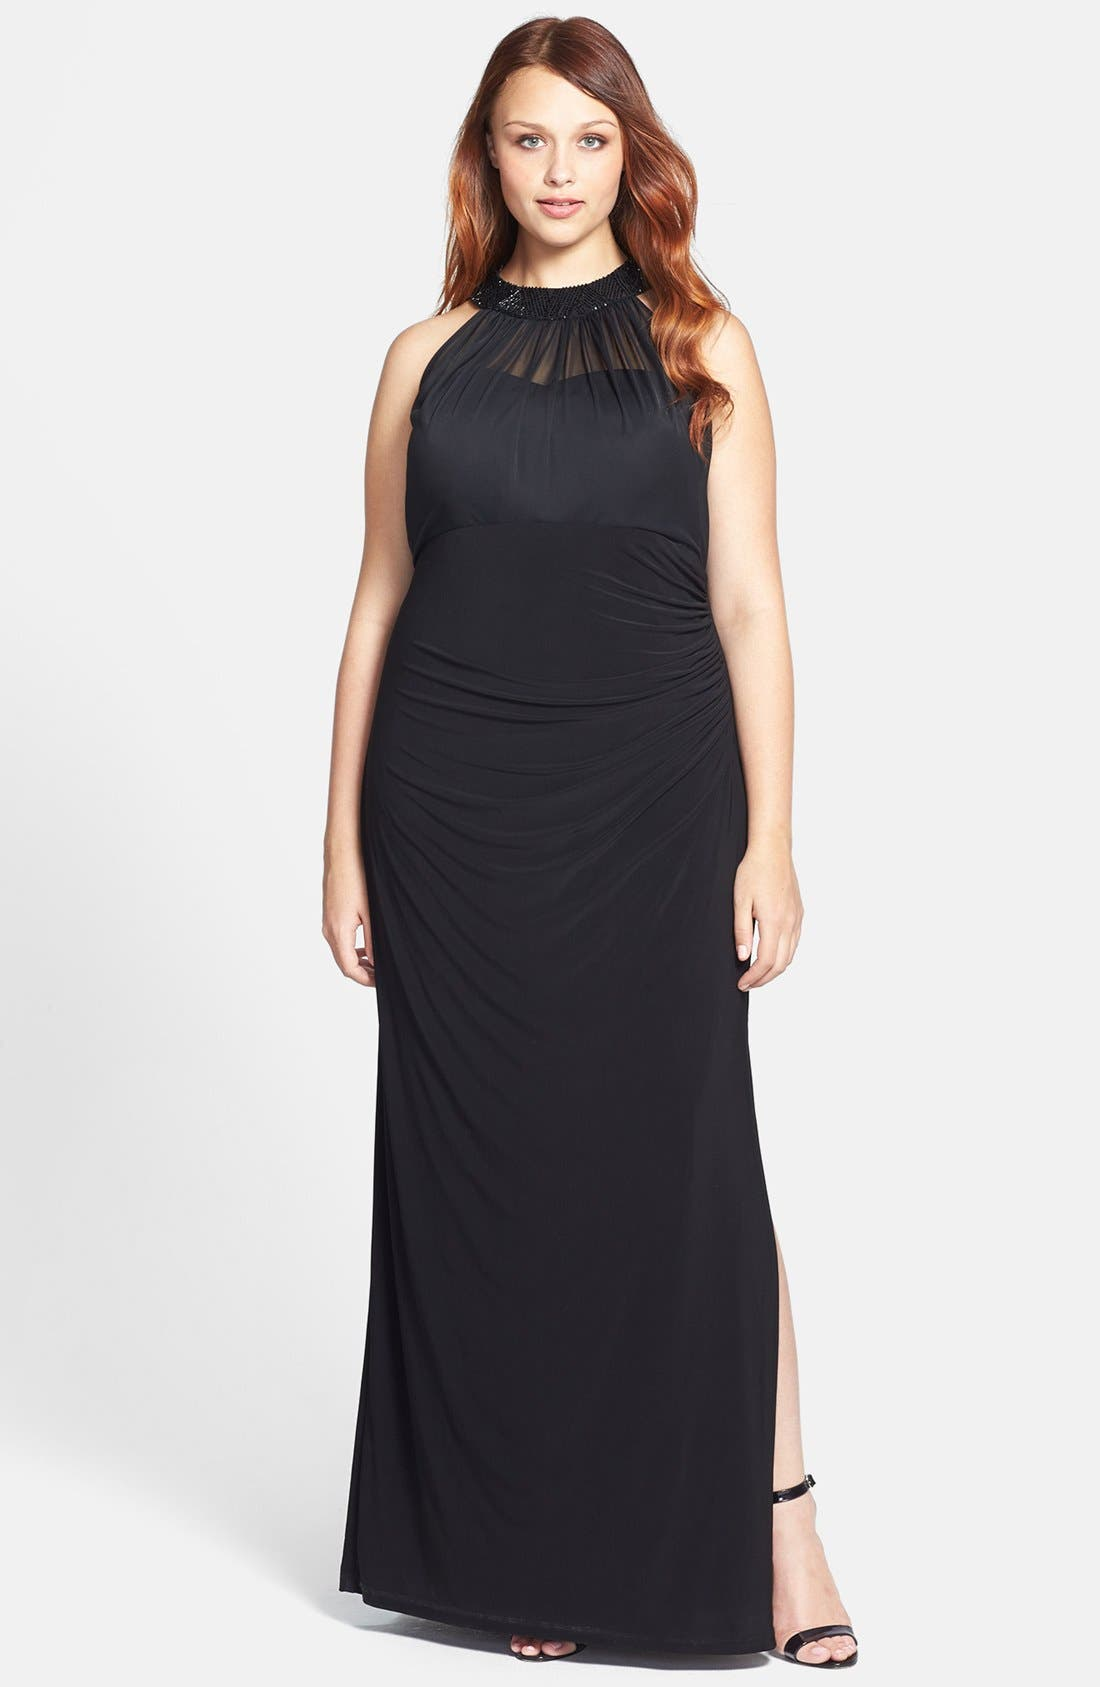 Alternate Image 1 Selected - Xscape Long Stretch Knit Dress (Plus Size)